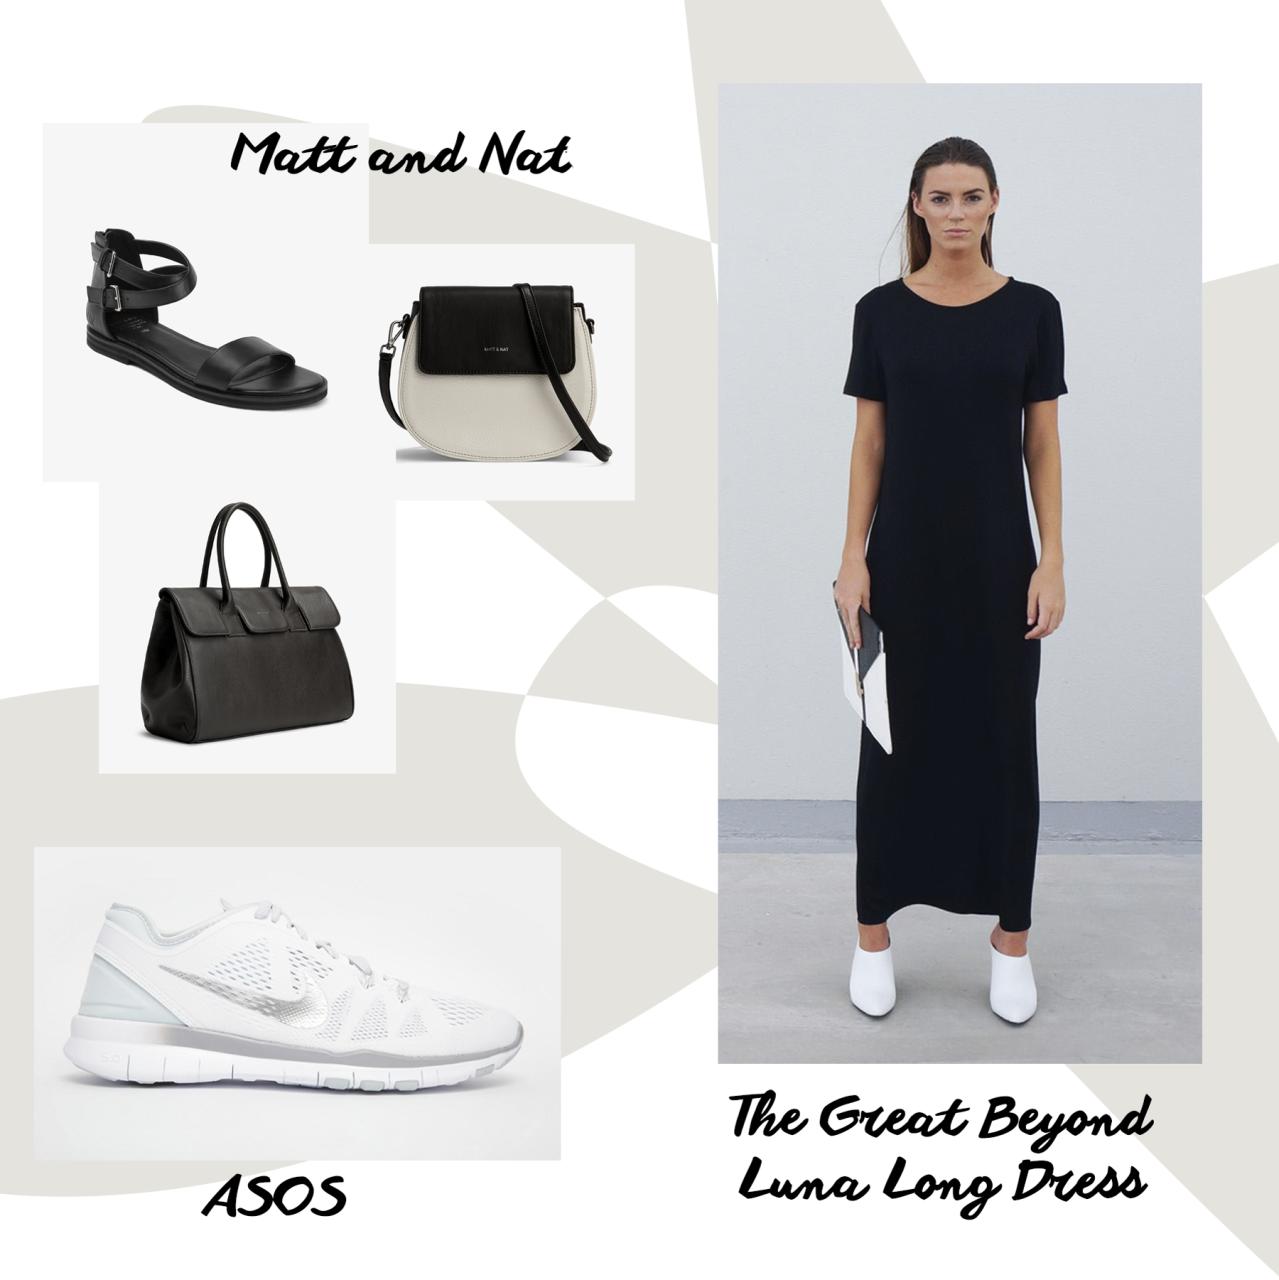 style-file-the-great-beyond-eco-fashion-luna-long-dress-black-maxi-dress-vegan-matt-and-natt-asos